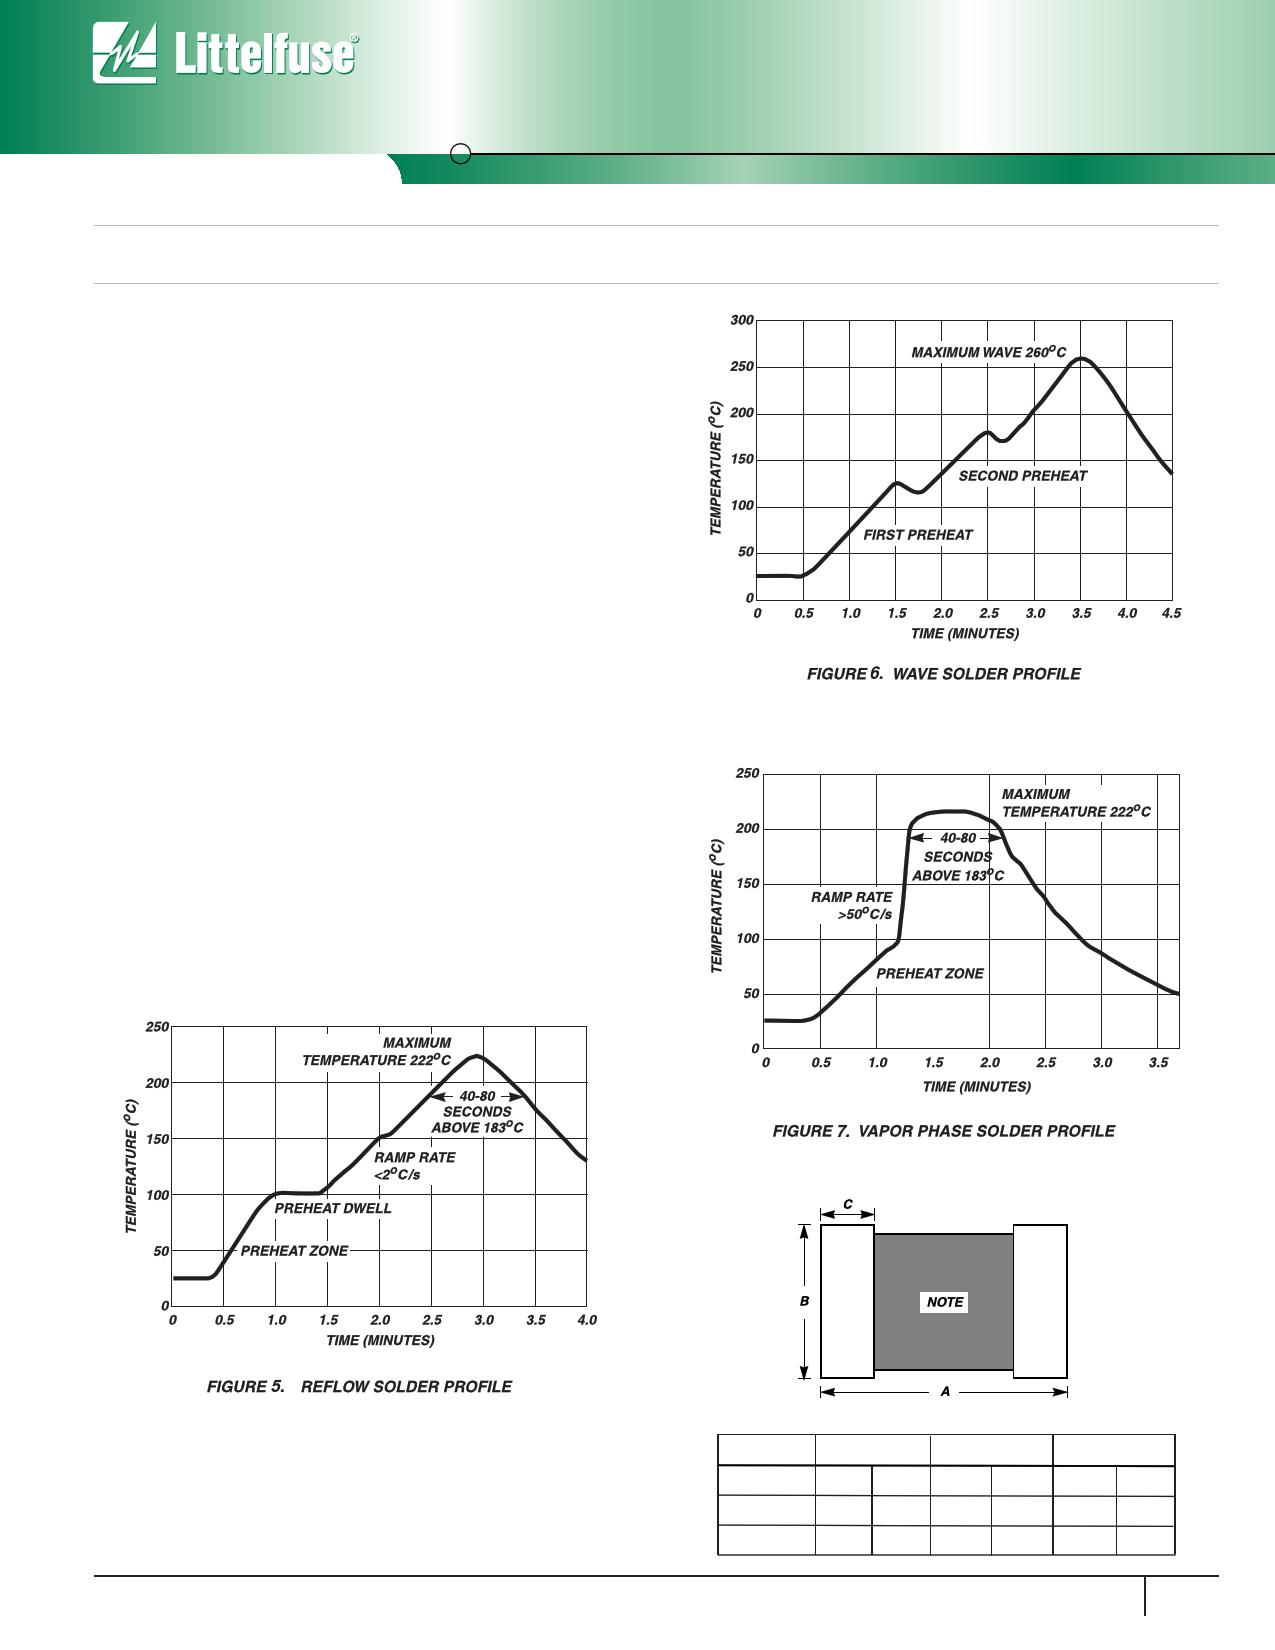 V0402MHS03 pdf, 電子部品, 半導体, ピン配列